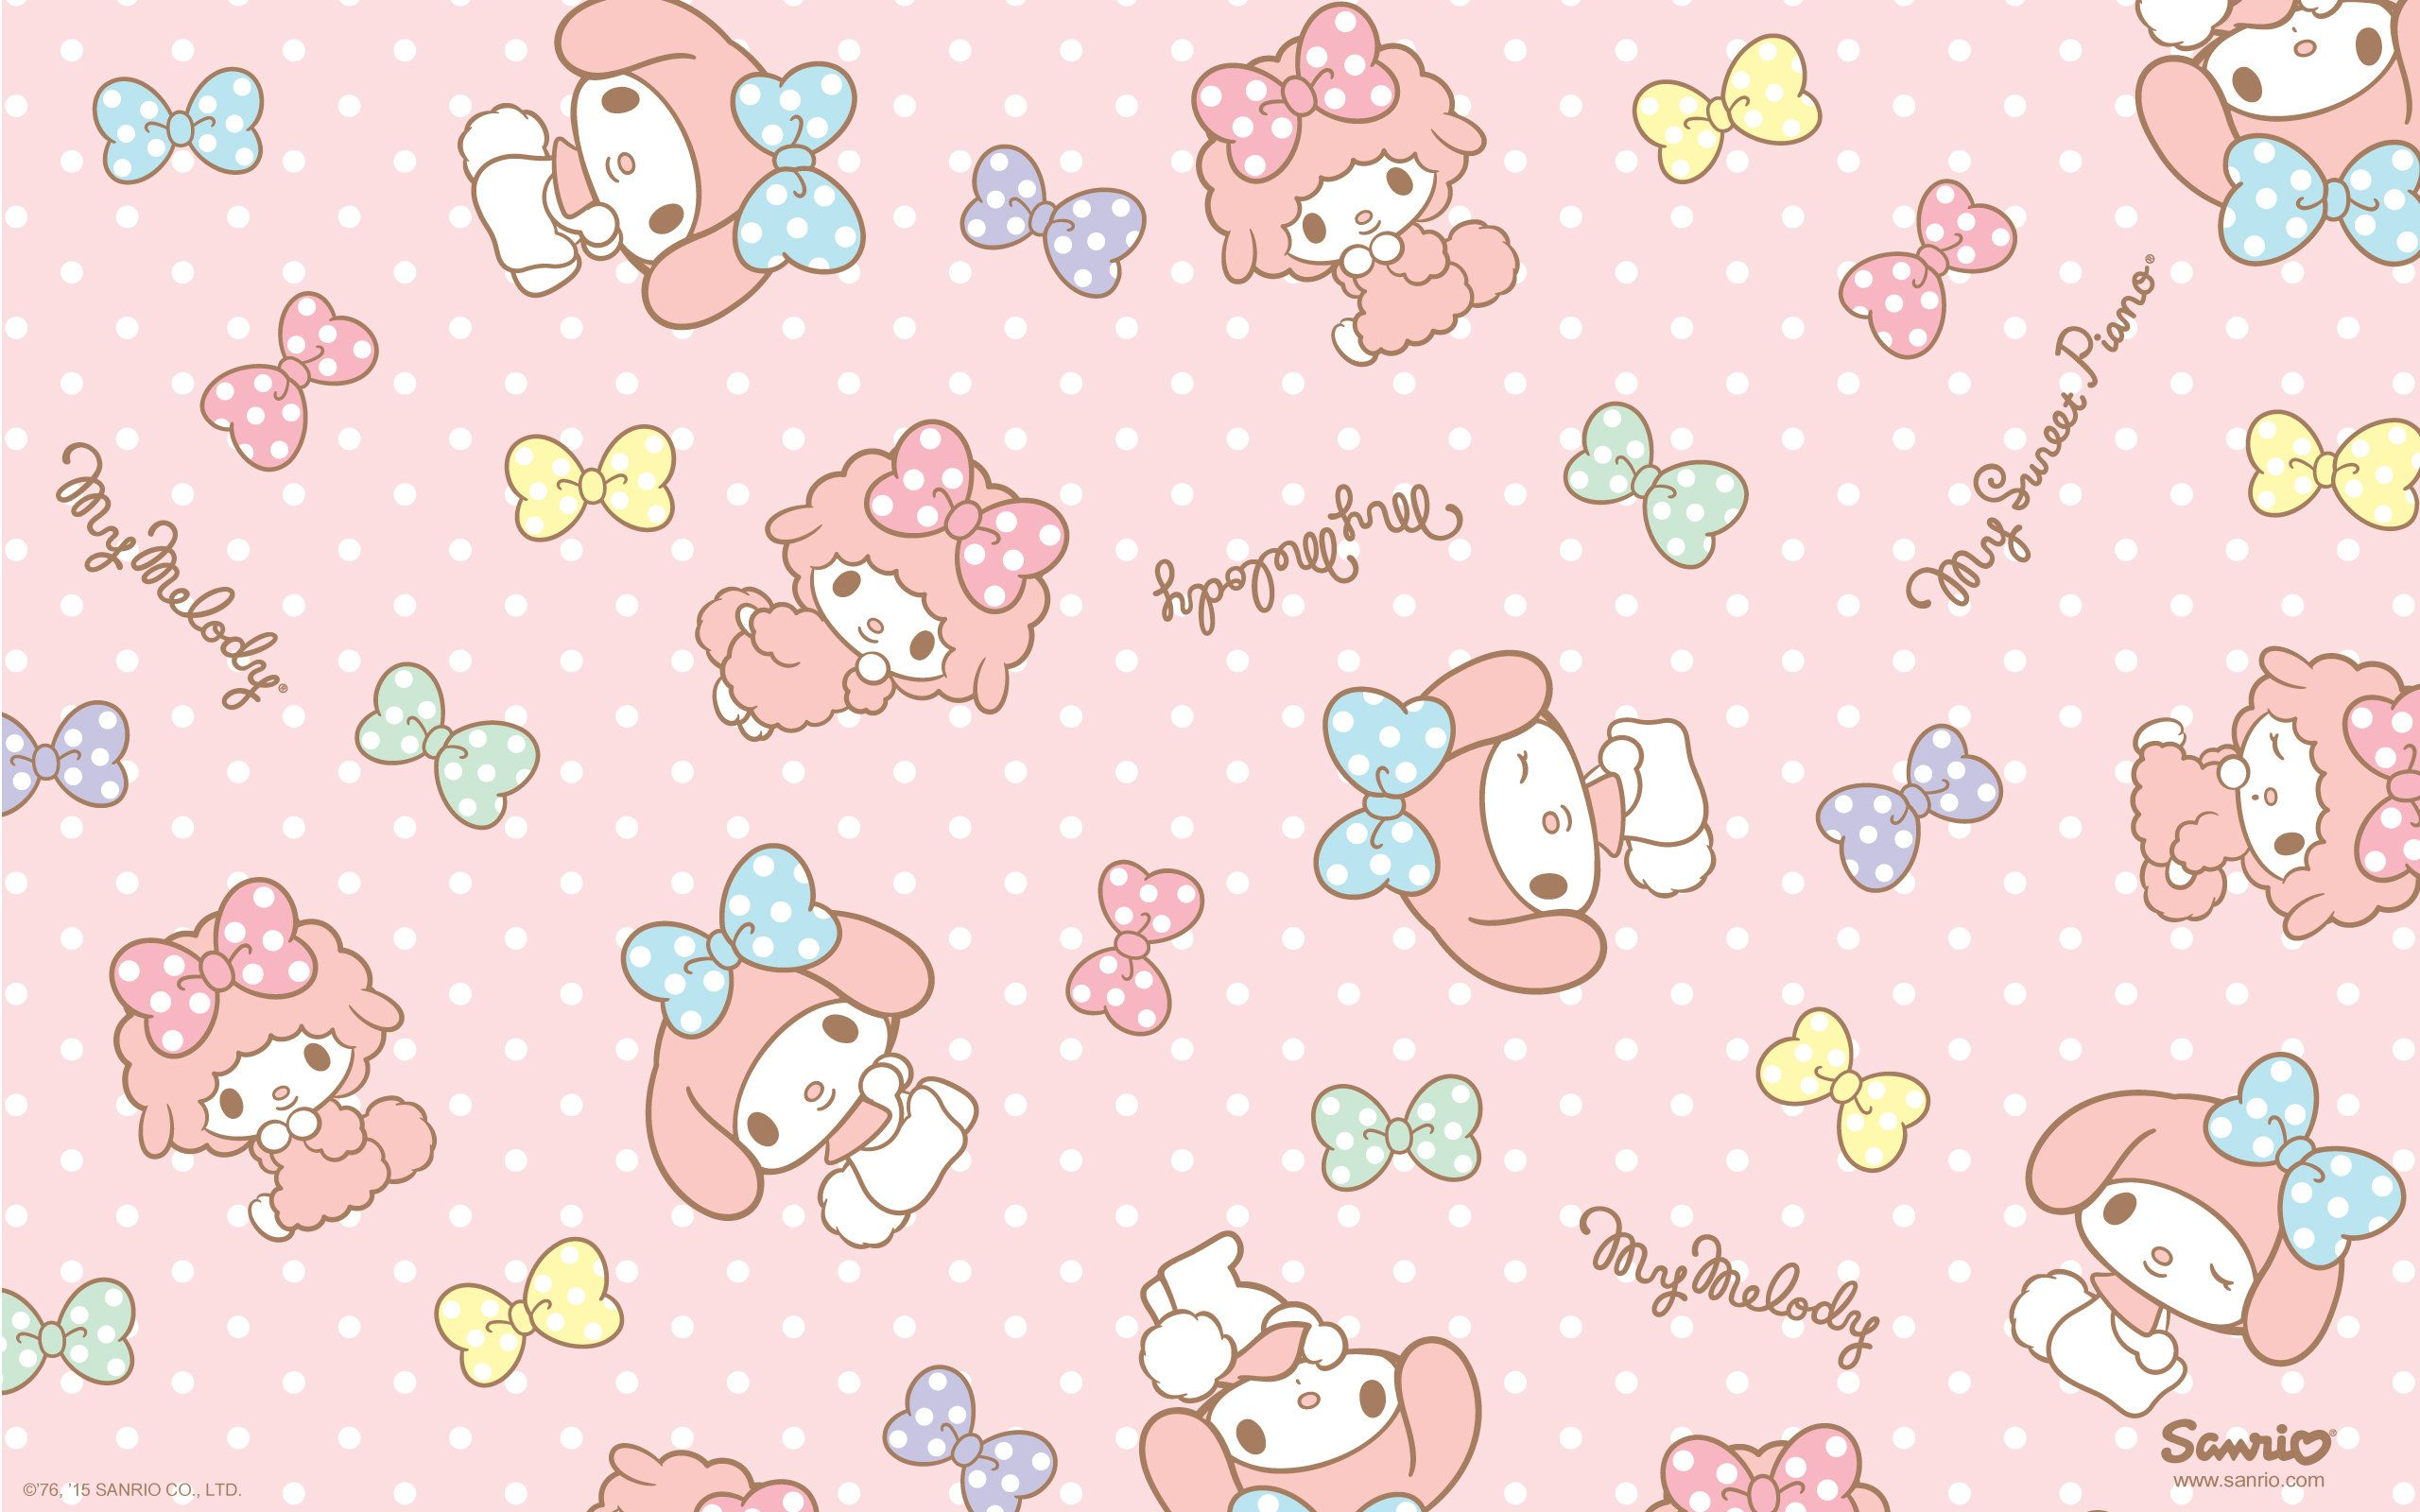 Kuromi My Melody Wallpaper Pc - Novocom.top